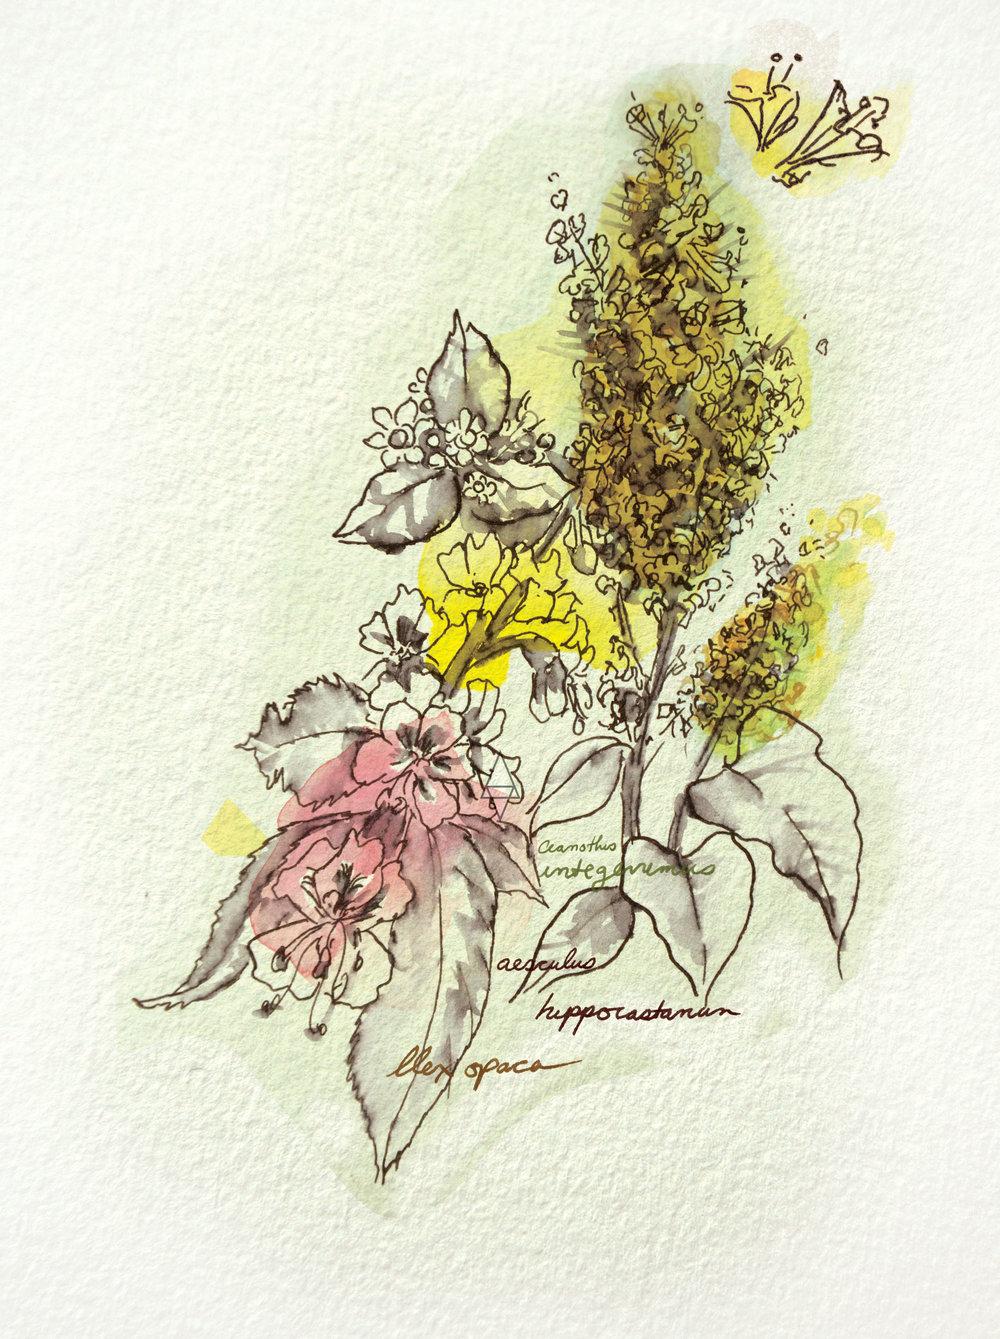 Illusrations by Rina Jakubowicz